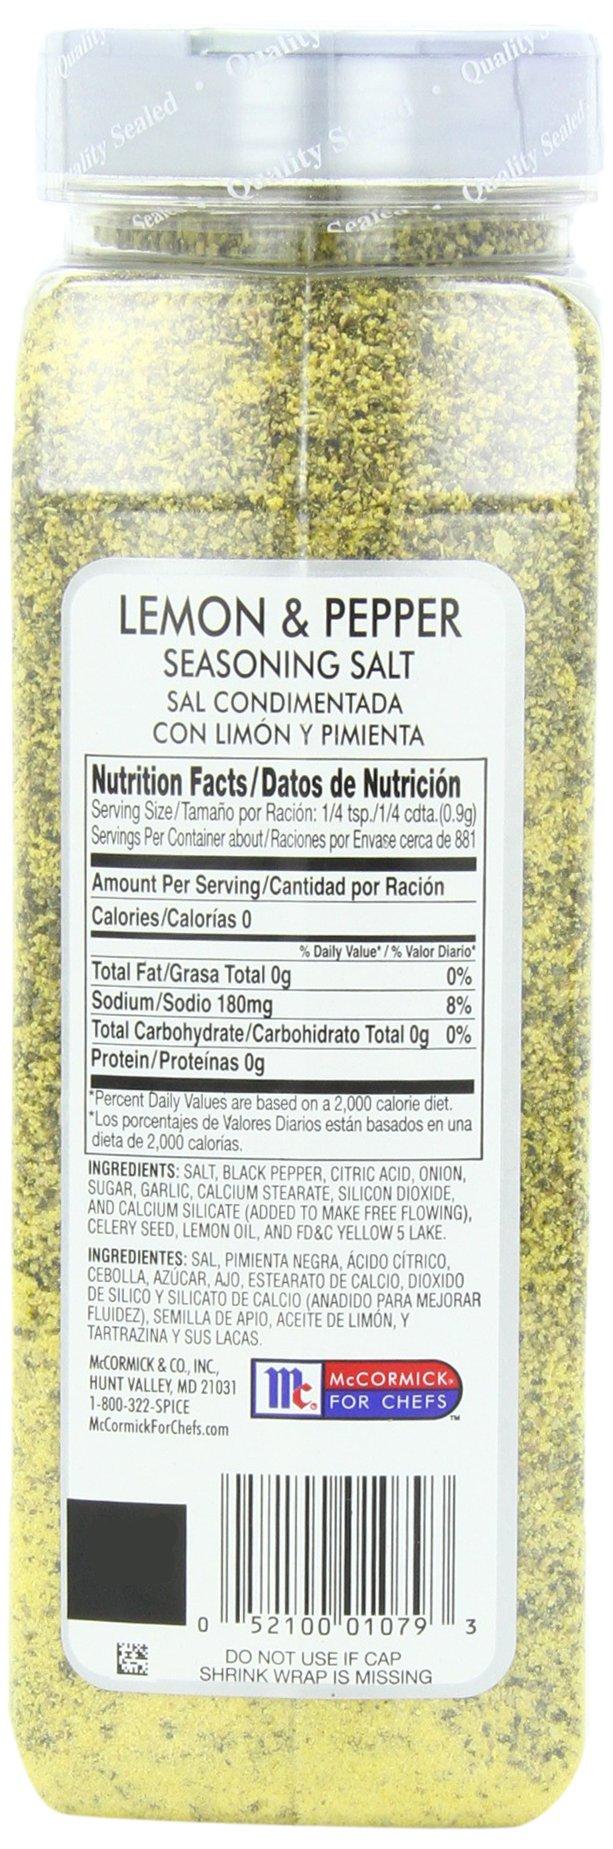 McCormick Culinary Lemon & Pepper Seasoning Salt, 28 oz by McCormick (Image #6)